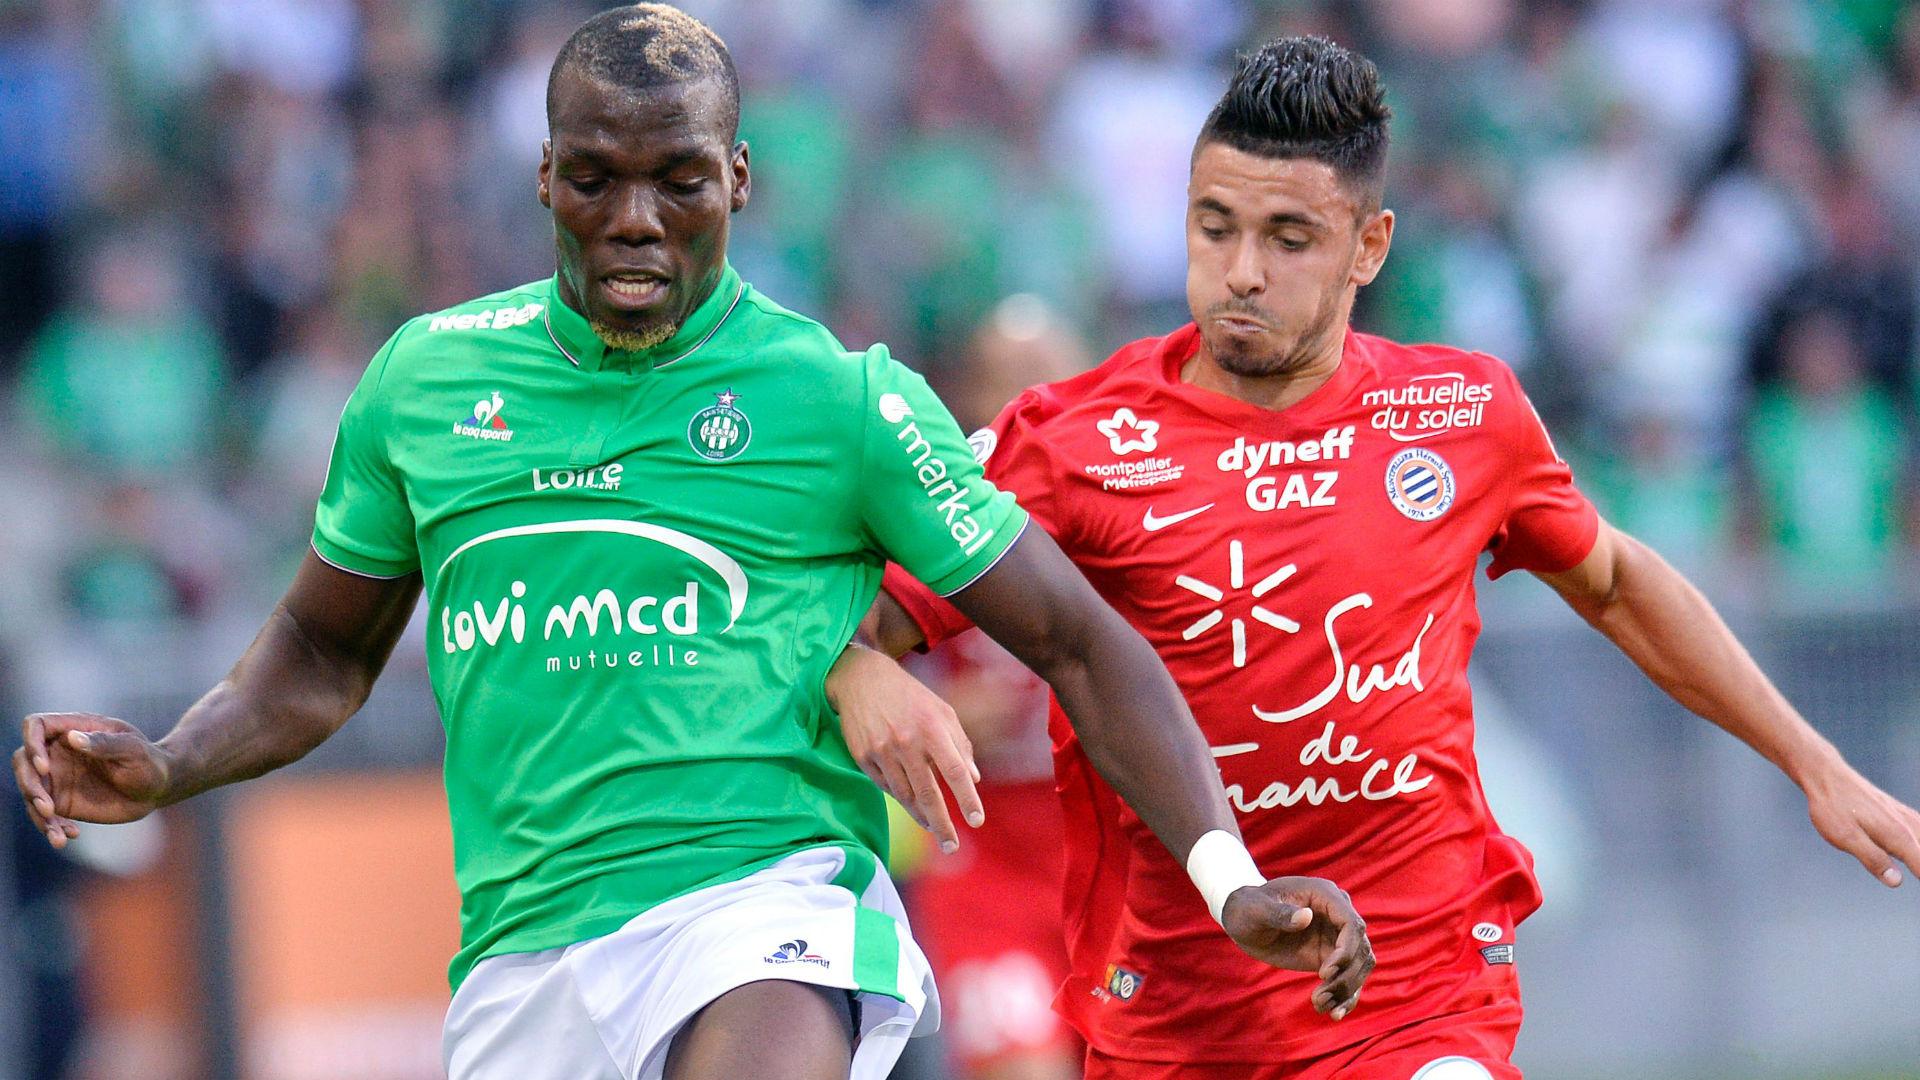 Saint Etienne vs Montpellier Betting Predictions